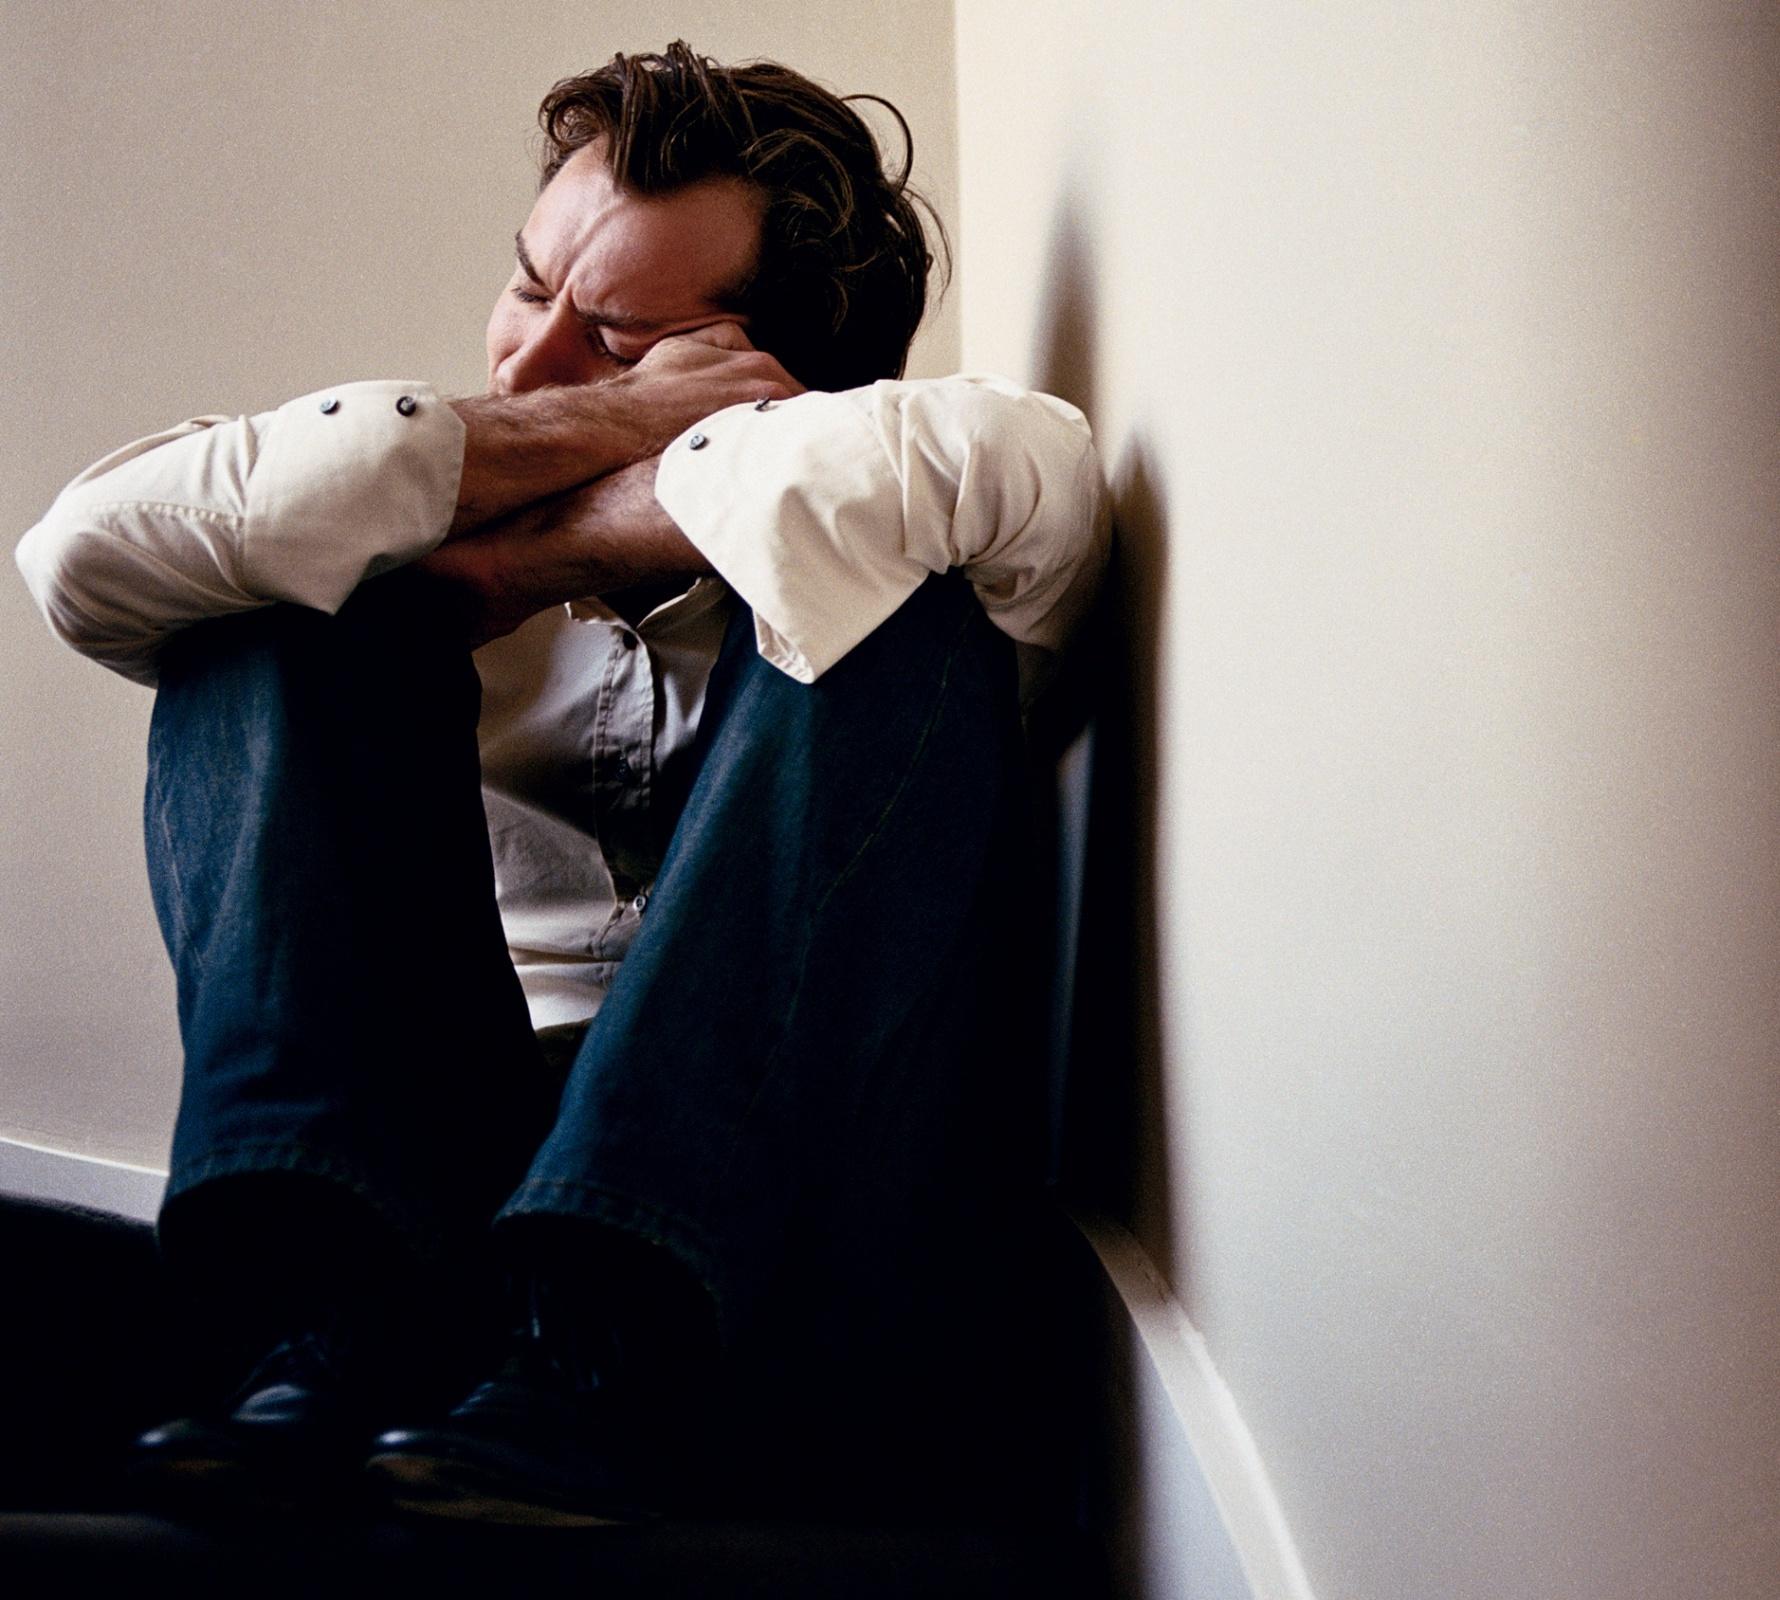 мужчина сидит грустный